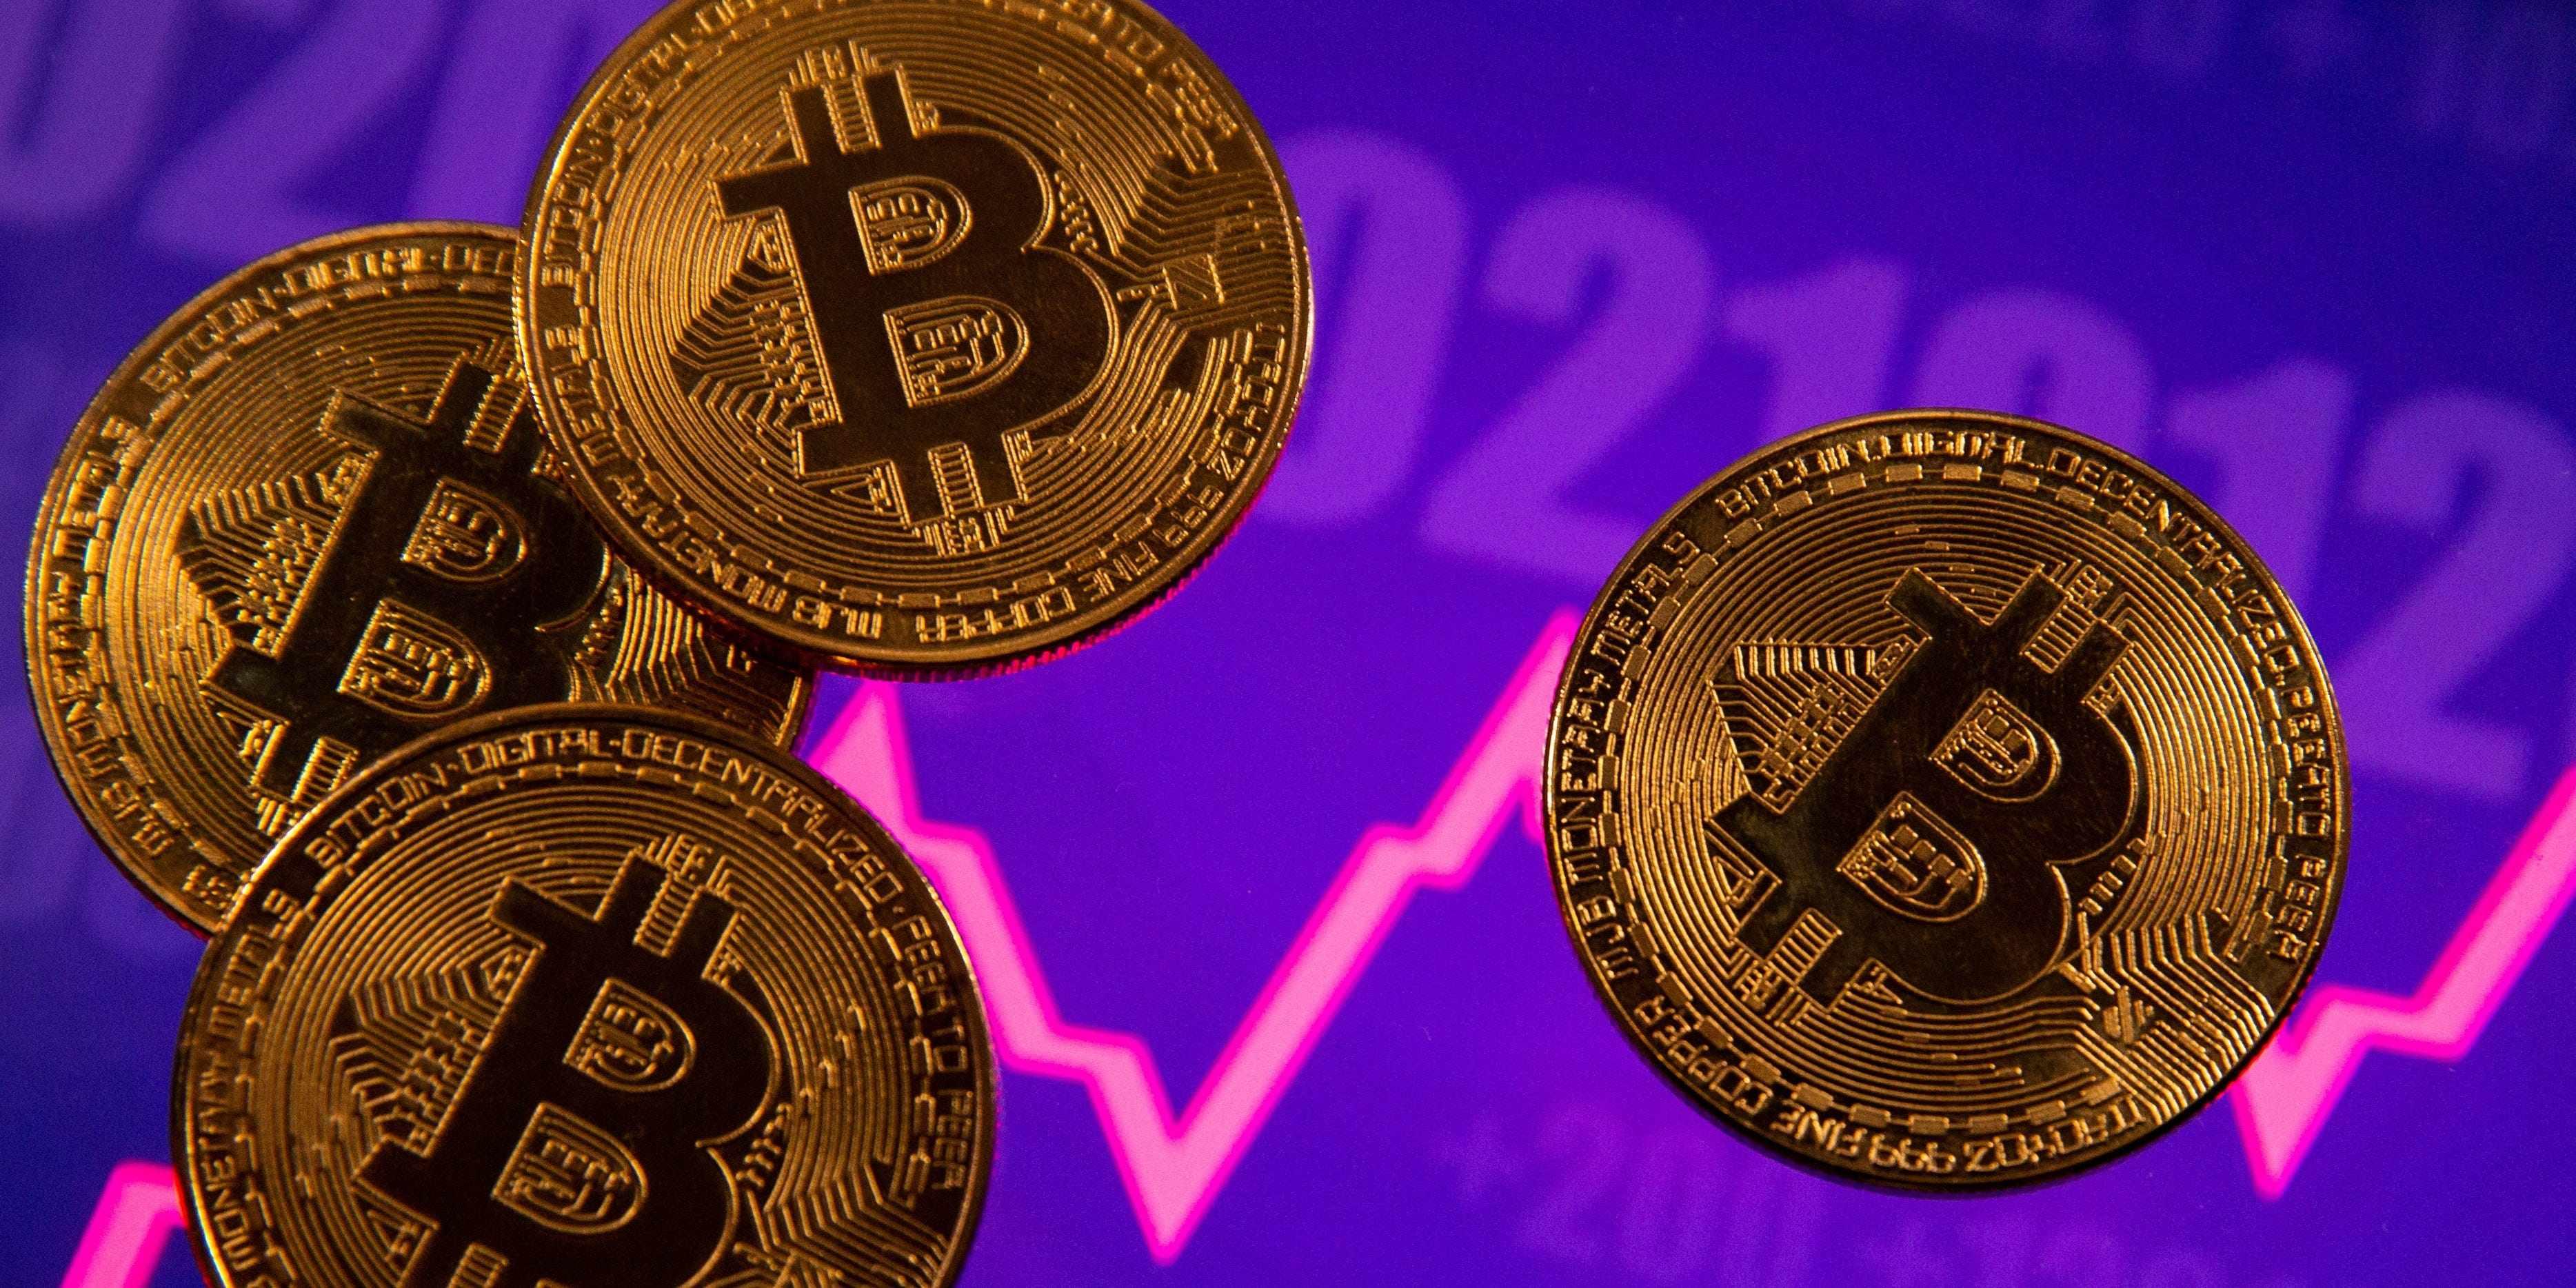 cryptocurrencies mastercard millennials consumers survey